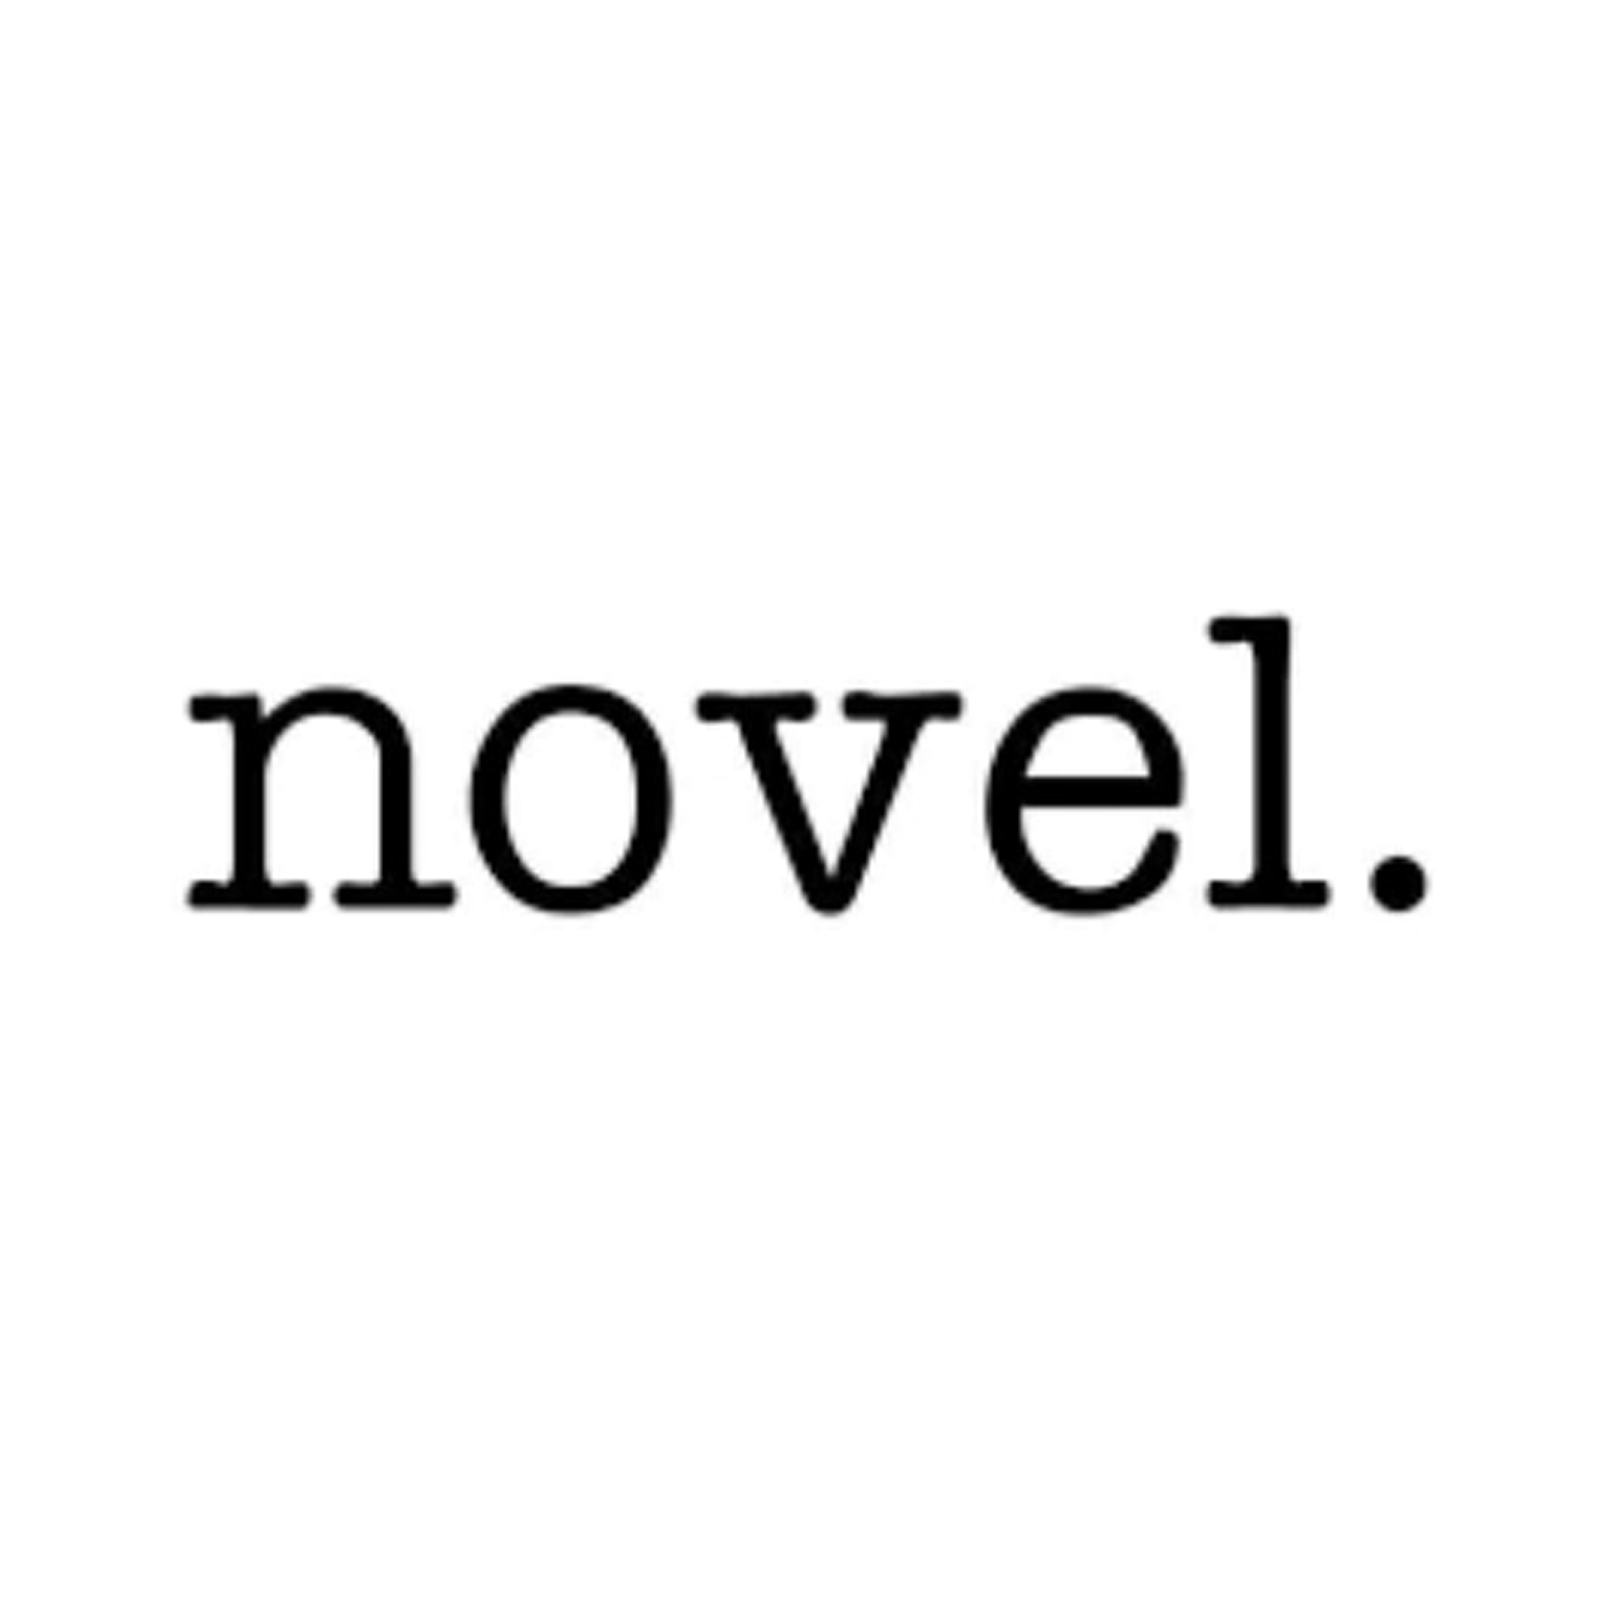 Novel Memphis Coupon Code | 30% Off in April → 7 Promos